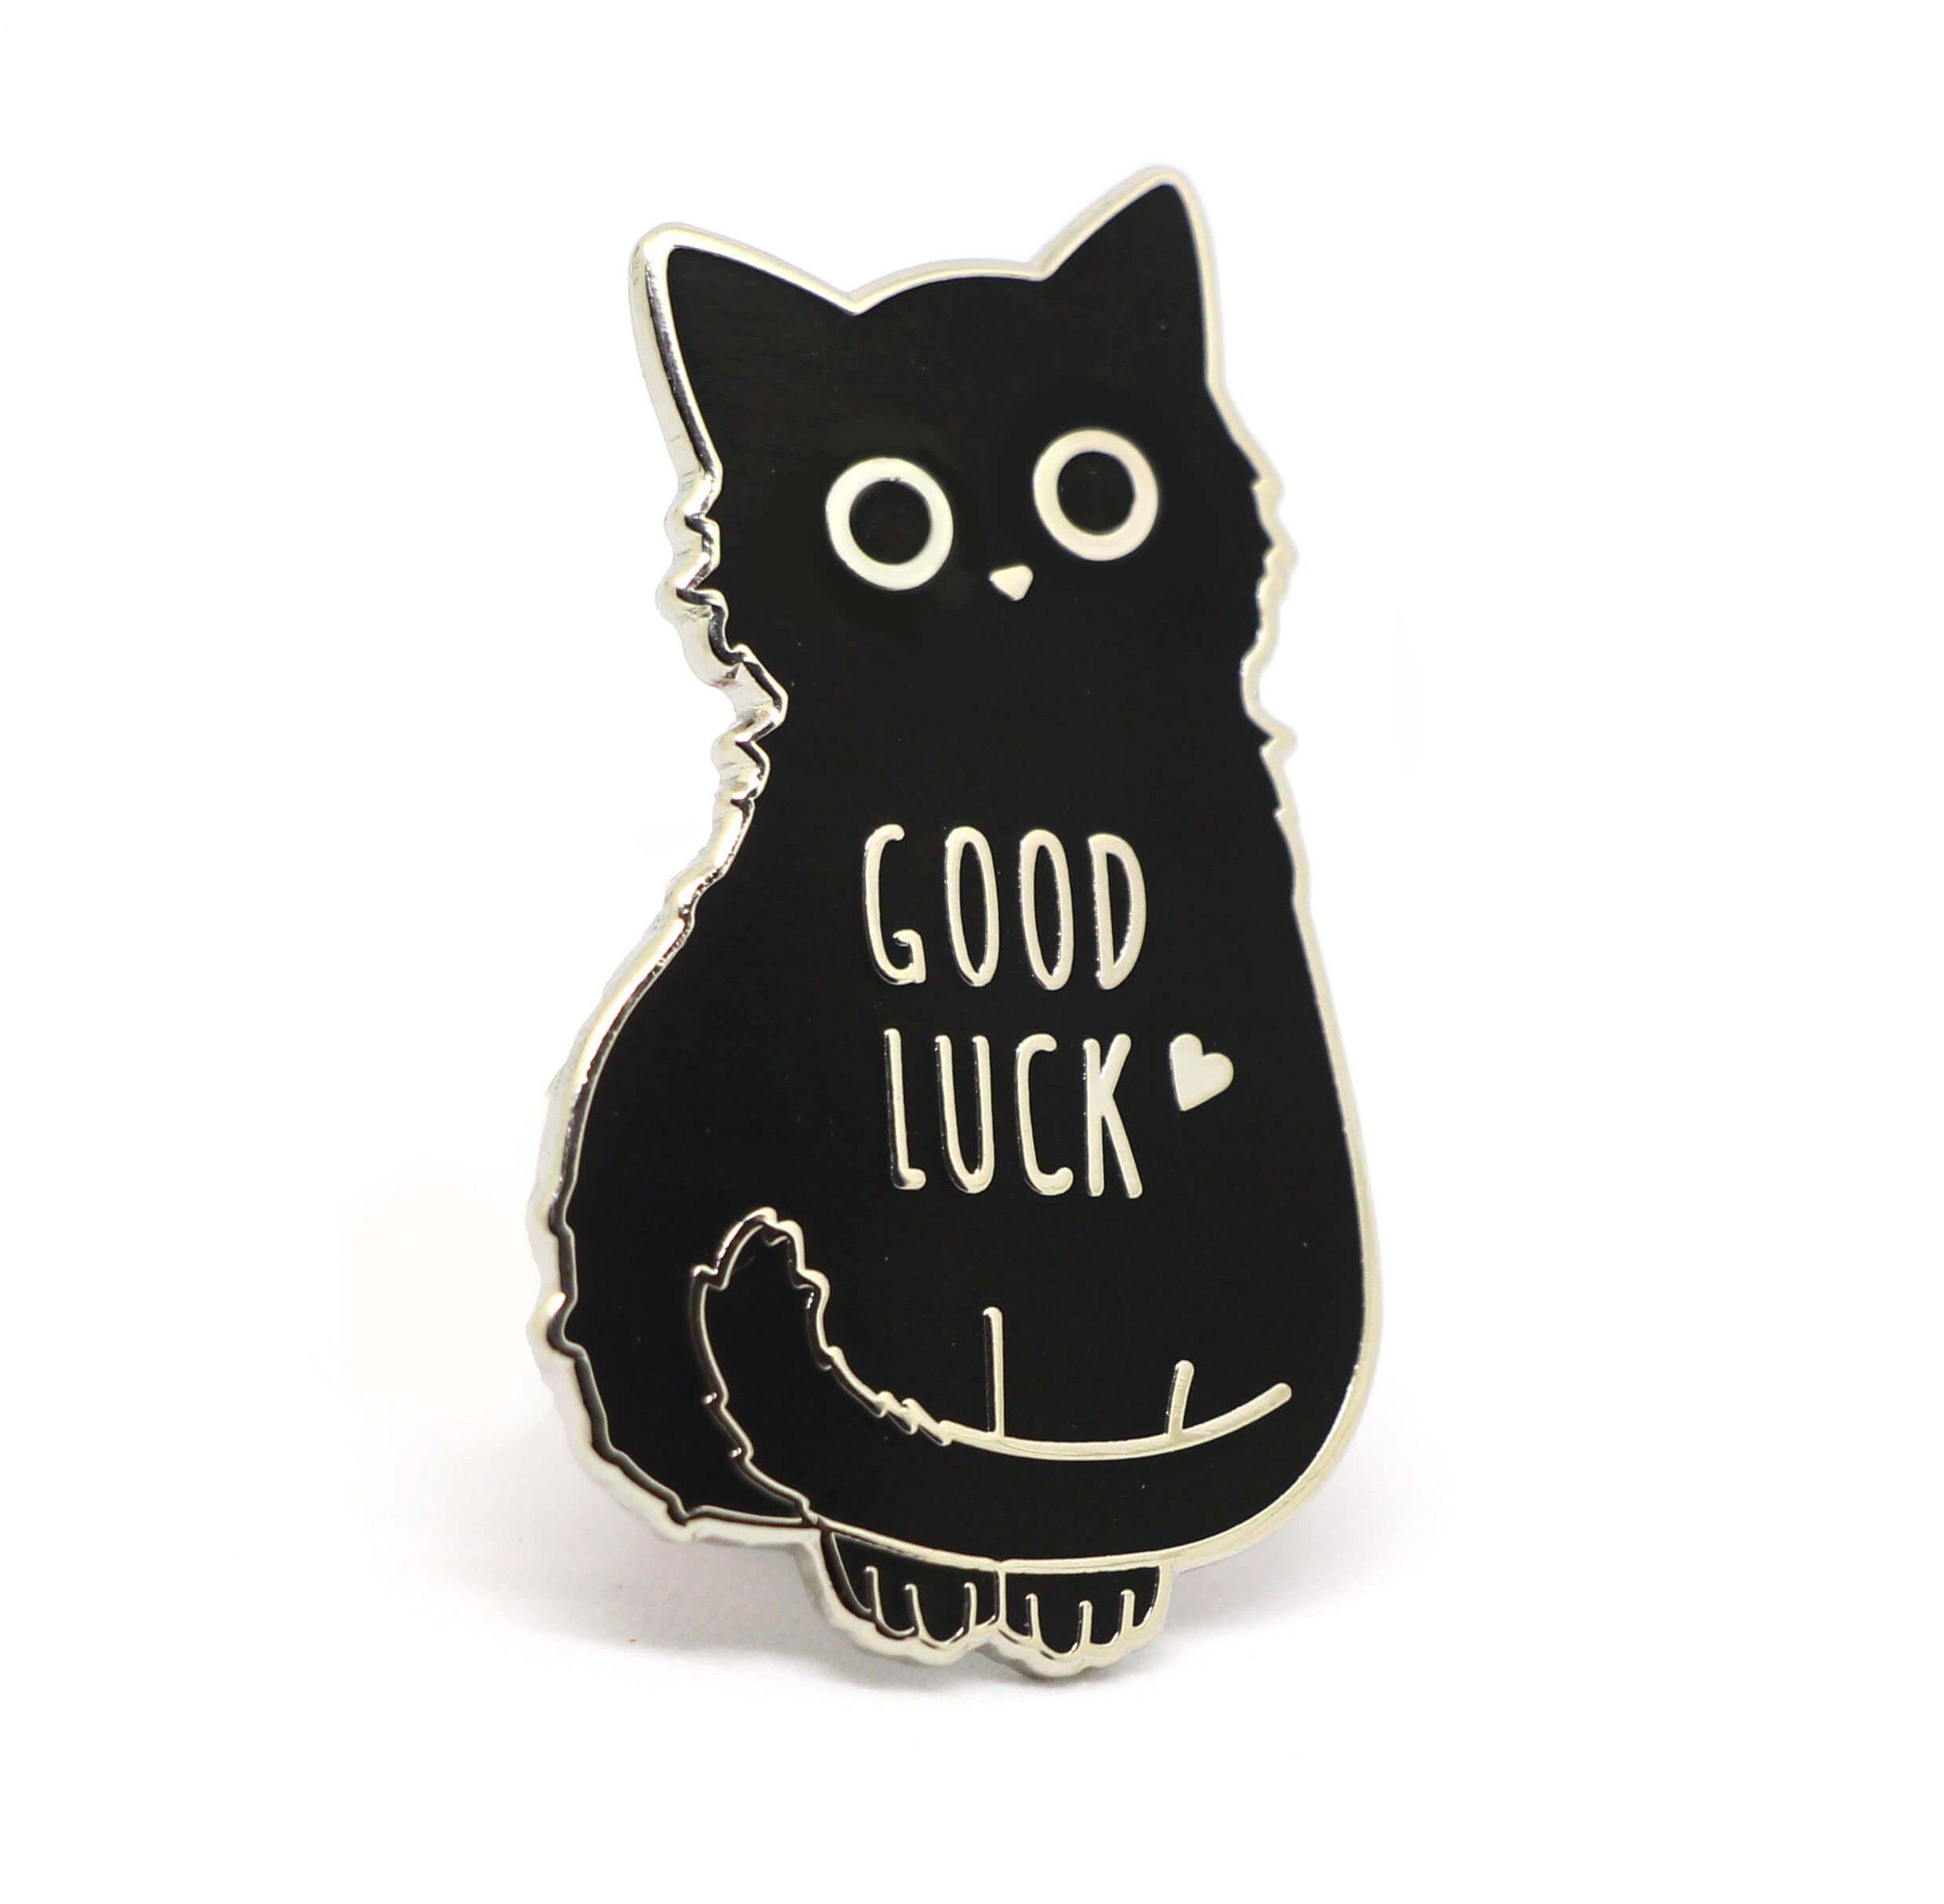 Good Luck Black Cat Enamel Pin Compoco